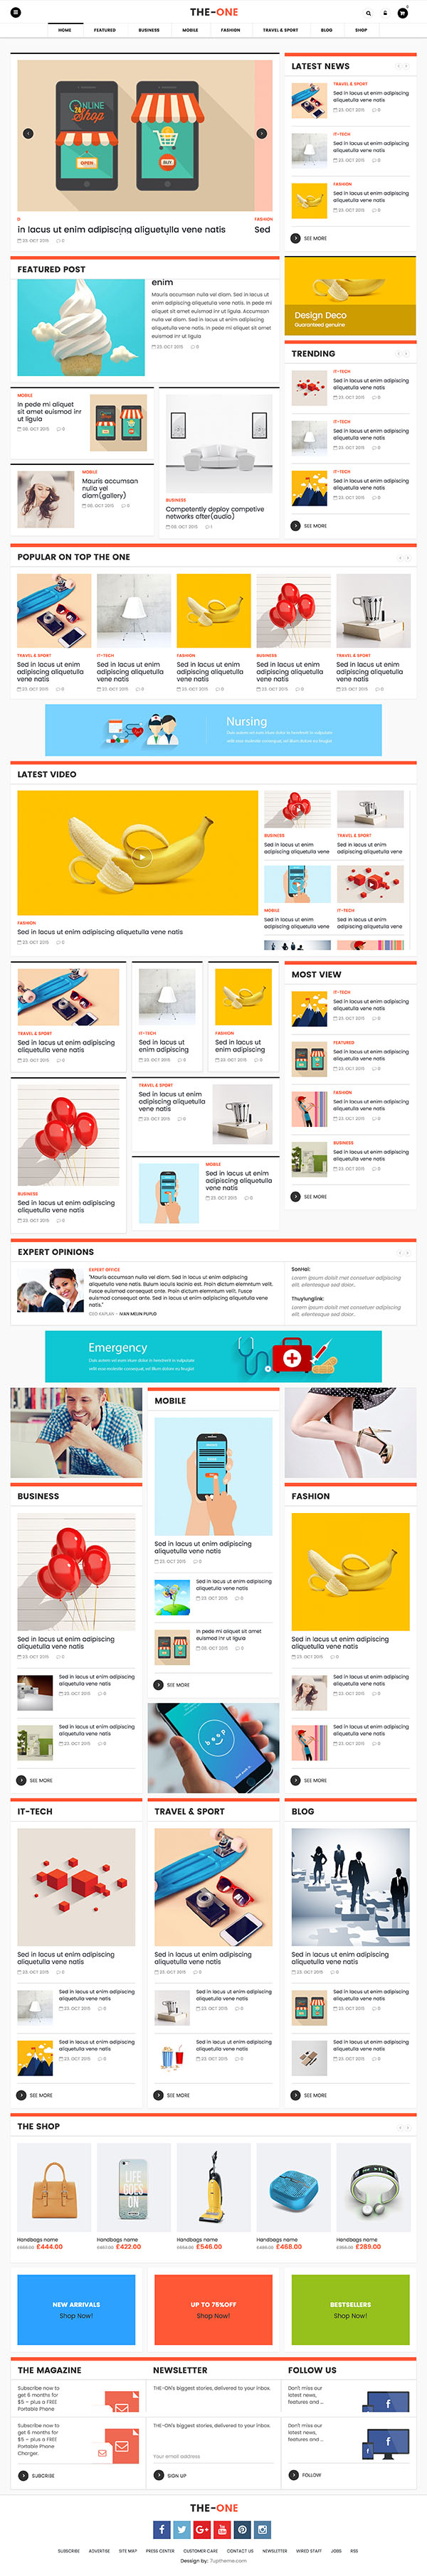 15 The One - Responsive Blog, News, & Magazine Theme